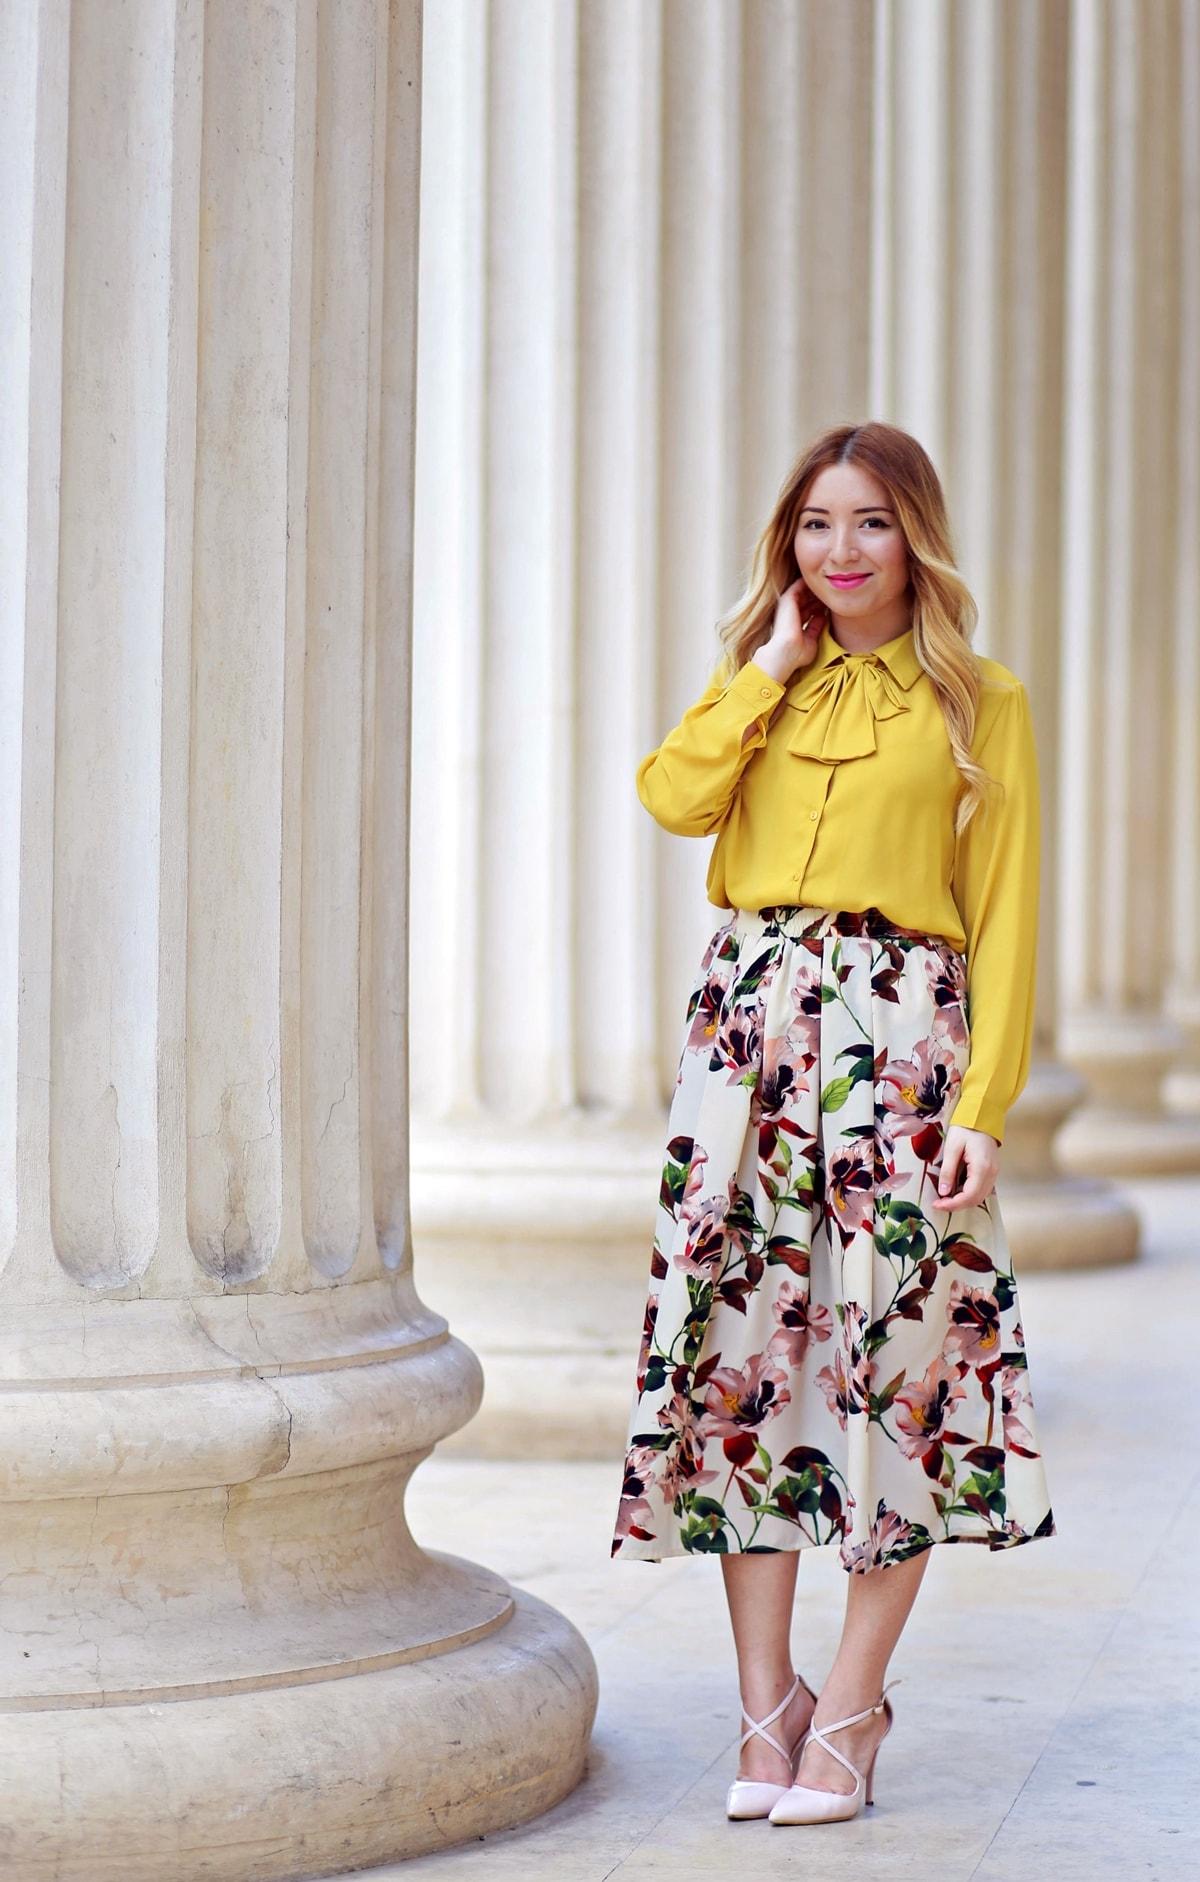 Andreea Ristea - tinuta romantica, vintage, fusta cu imprimeu floral, midi, tinuta primavara vara, 2016, camasa cu funda galben mustar, tinuta tipologie toamna